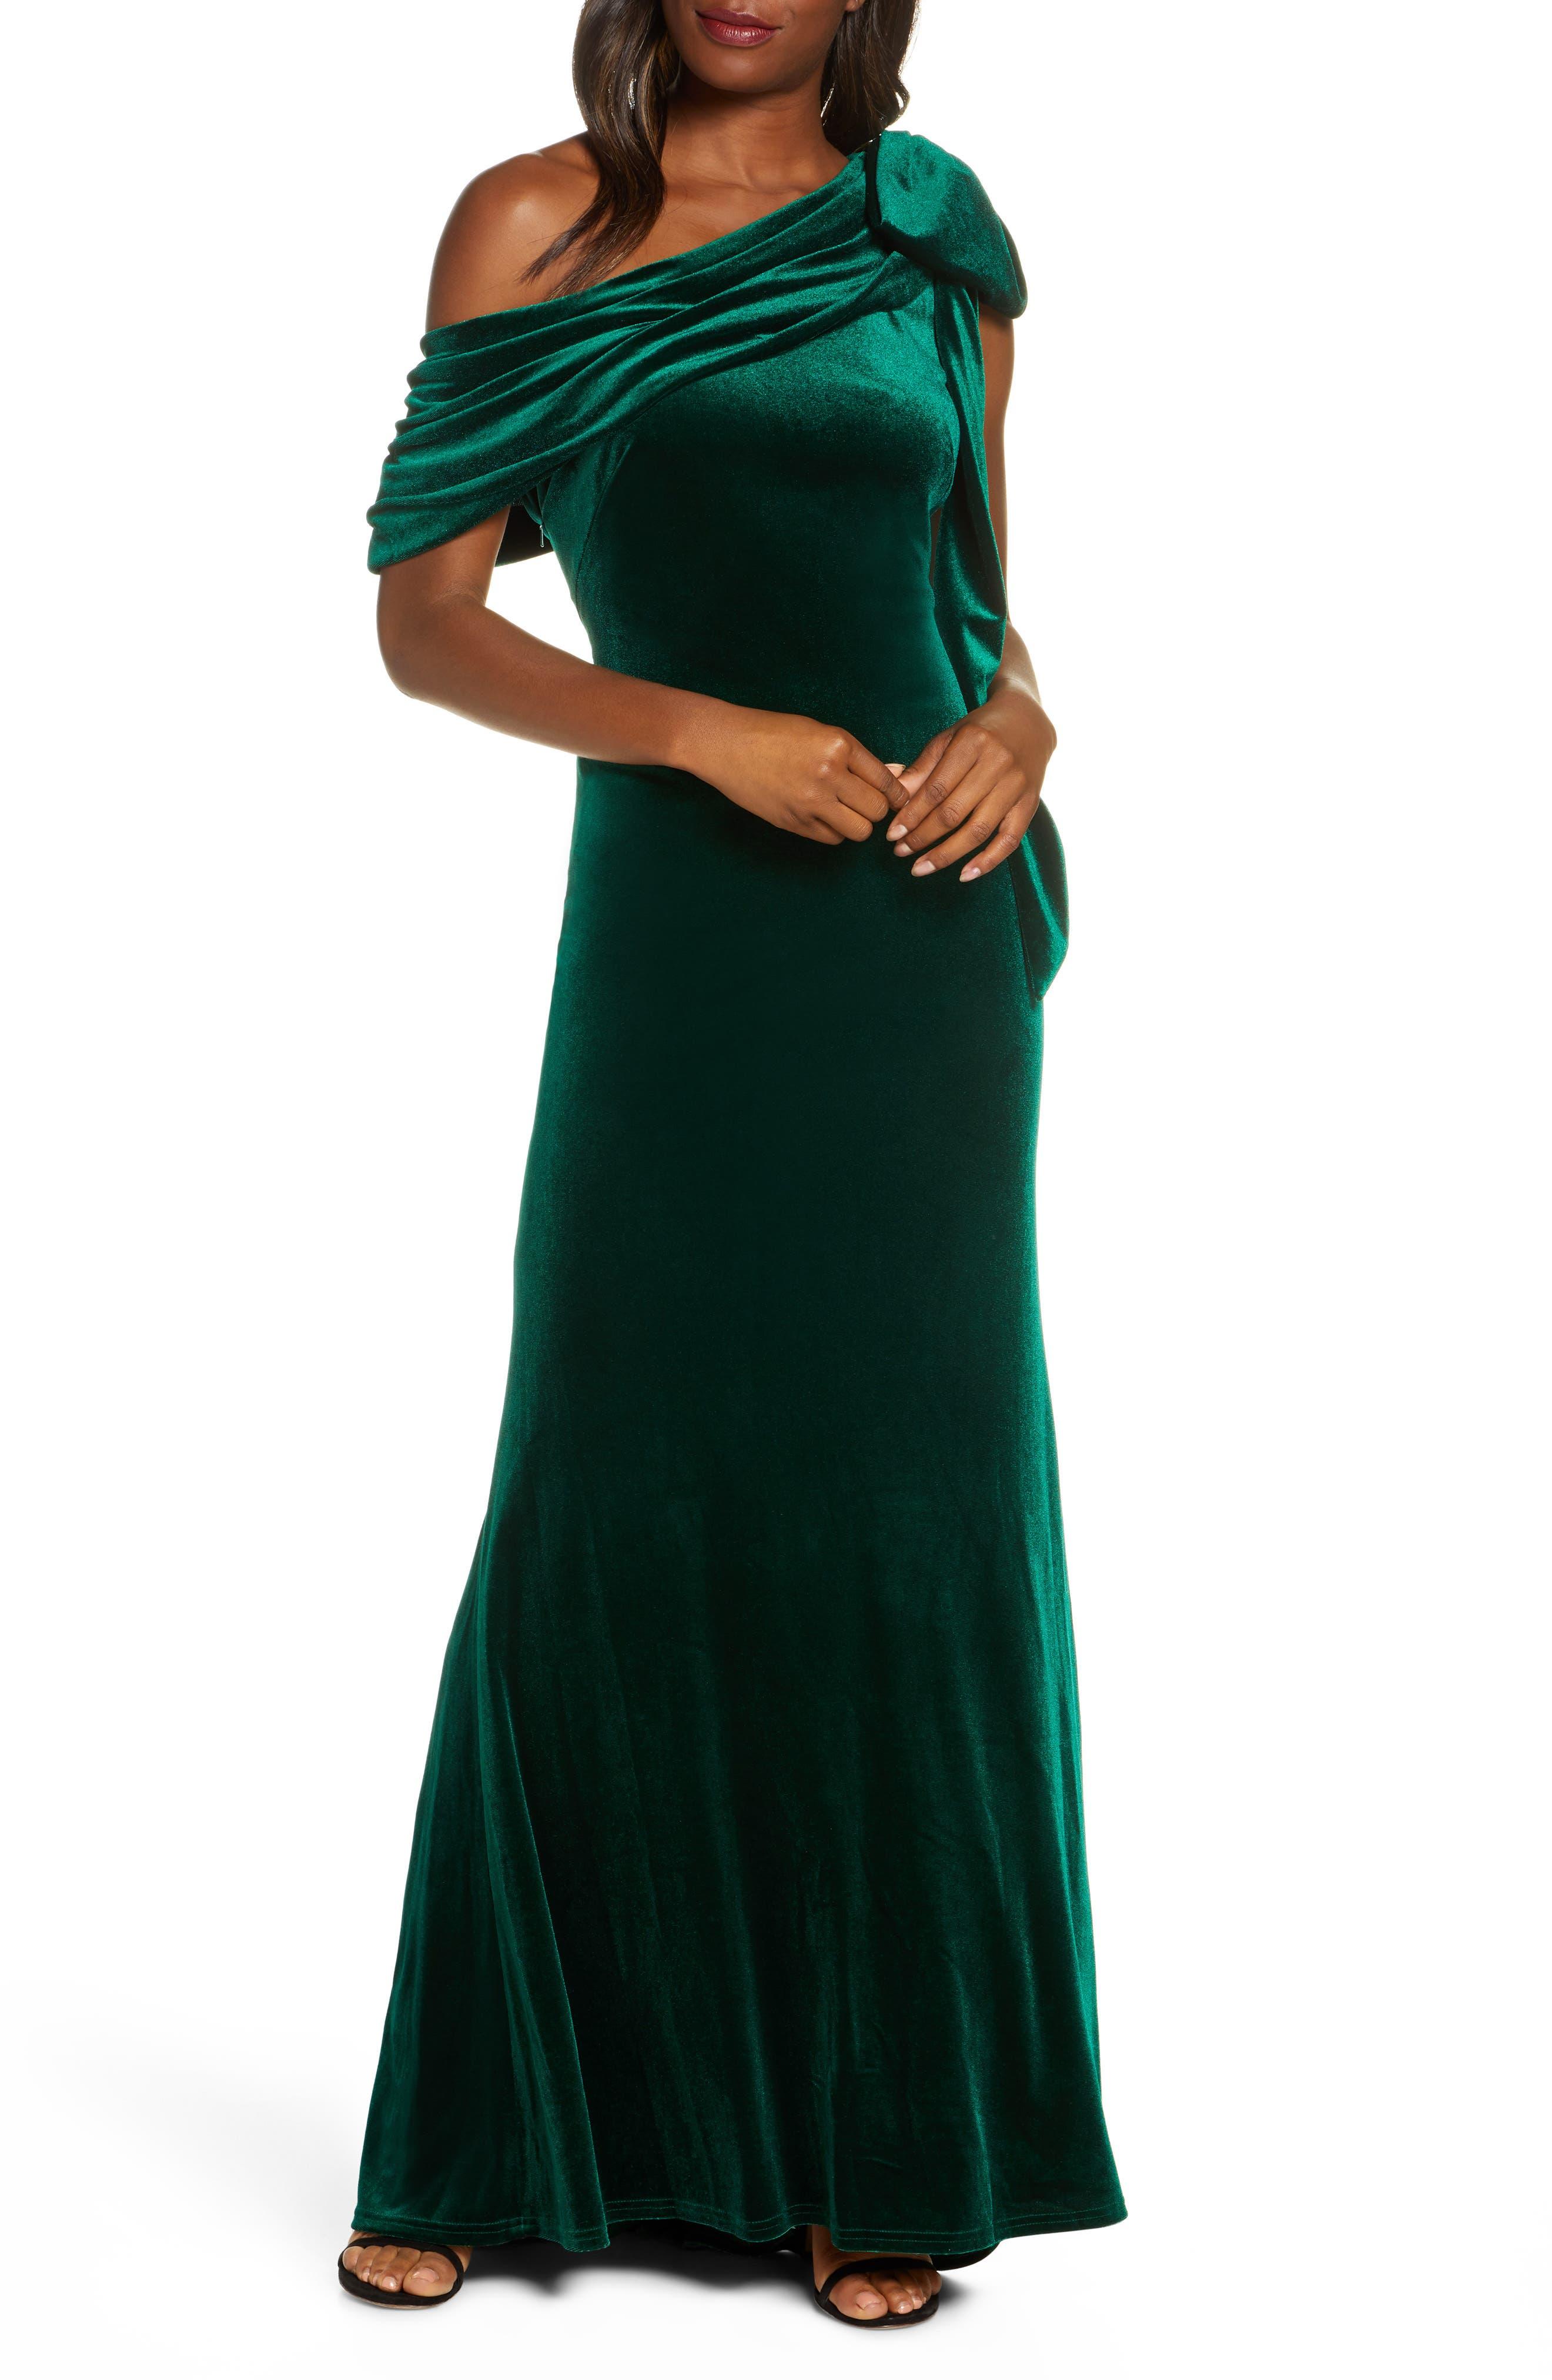 1950s Formal Dresses & Evening Gowns to Buy Womens Tadashi Shoji One-Shoulder Bow Velvet Gown $408.00 AT vintagedancer.com